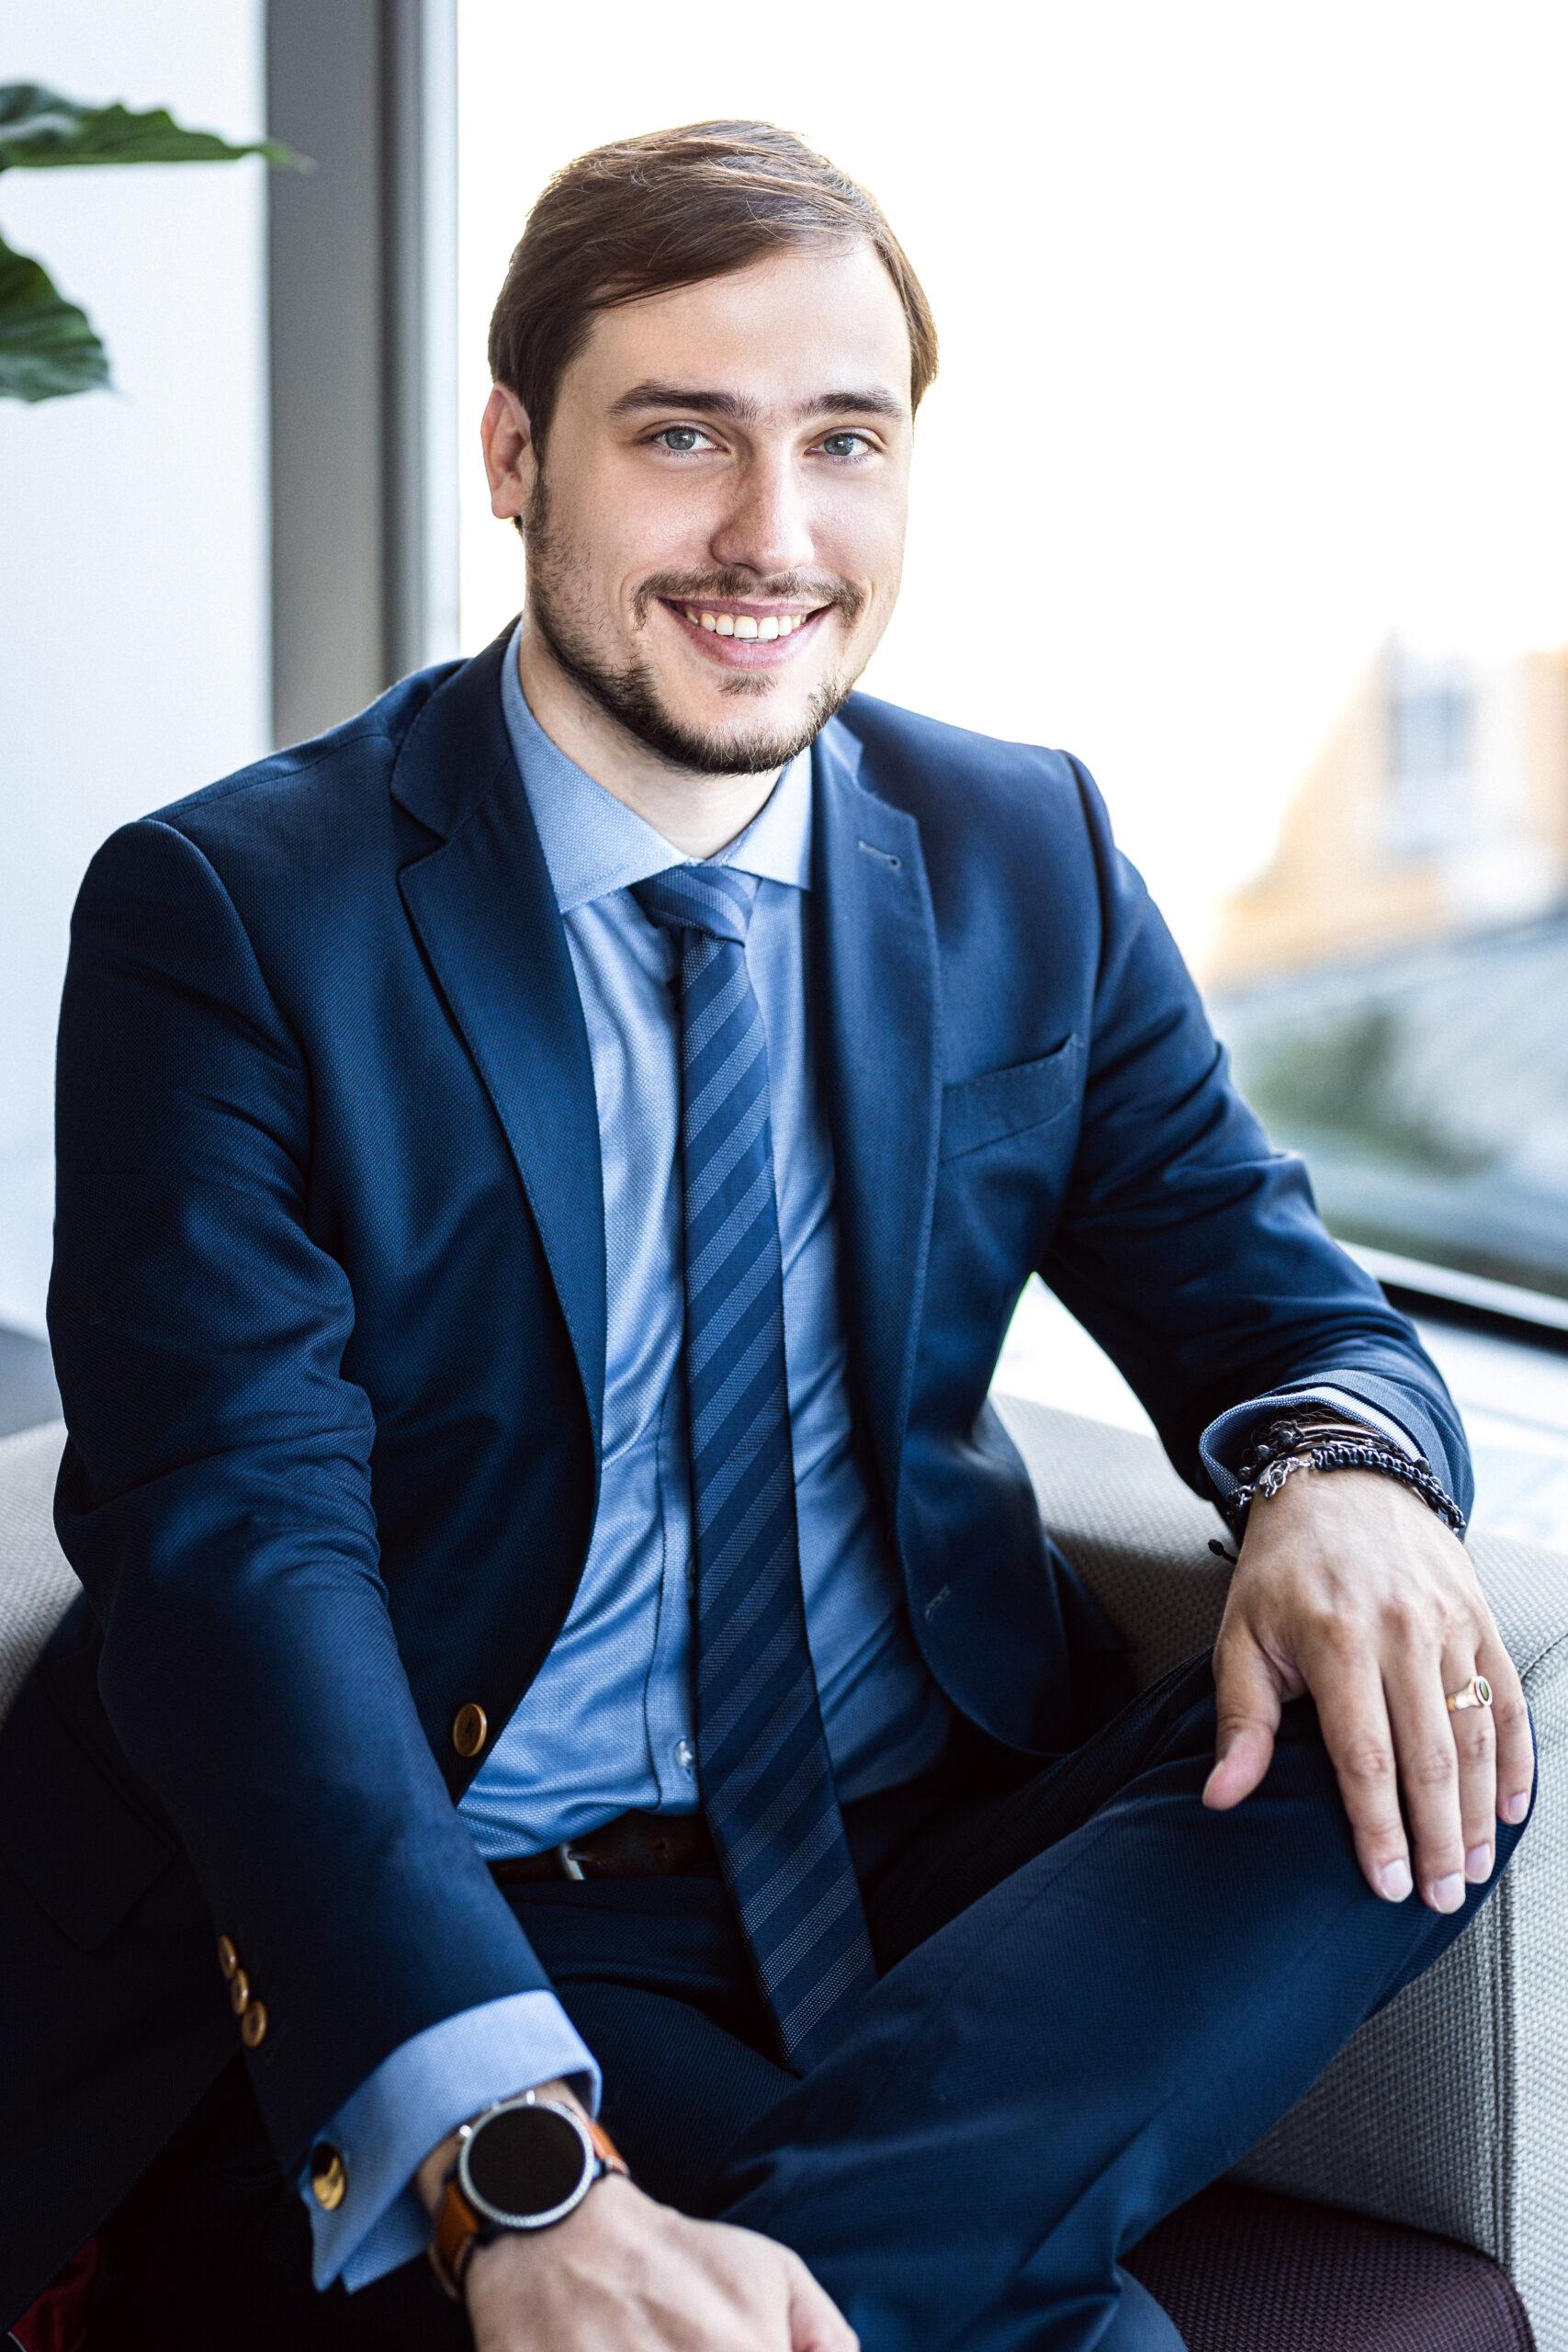 Dominik Stroukal